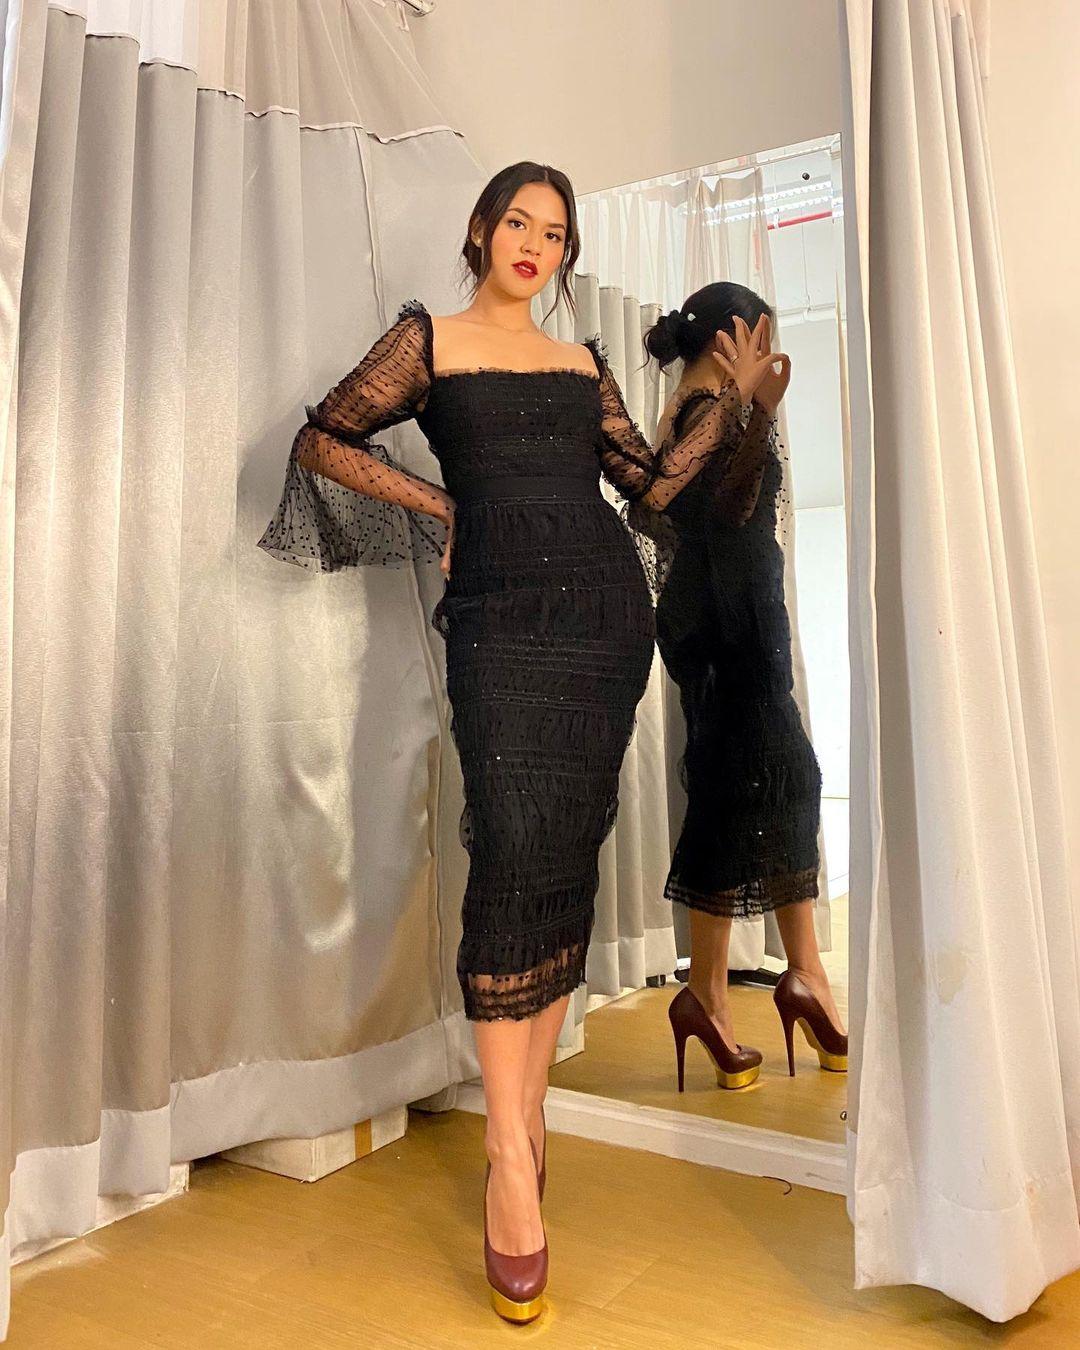 5 Potret Raisa mengenakan outfit serba hitam, modis dan elegan